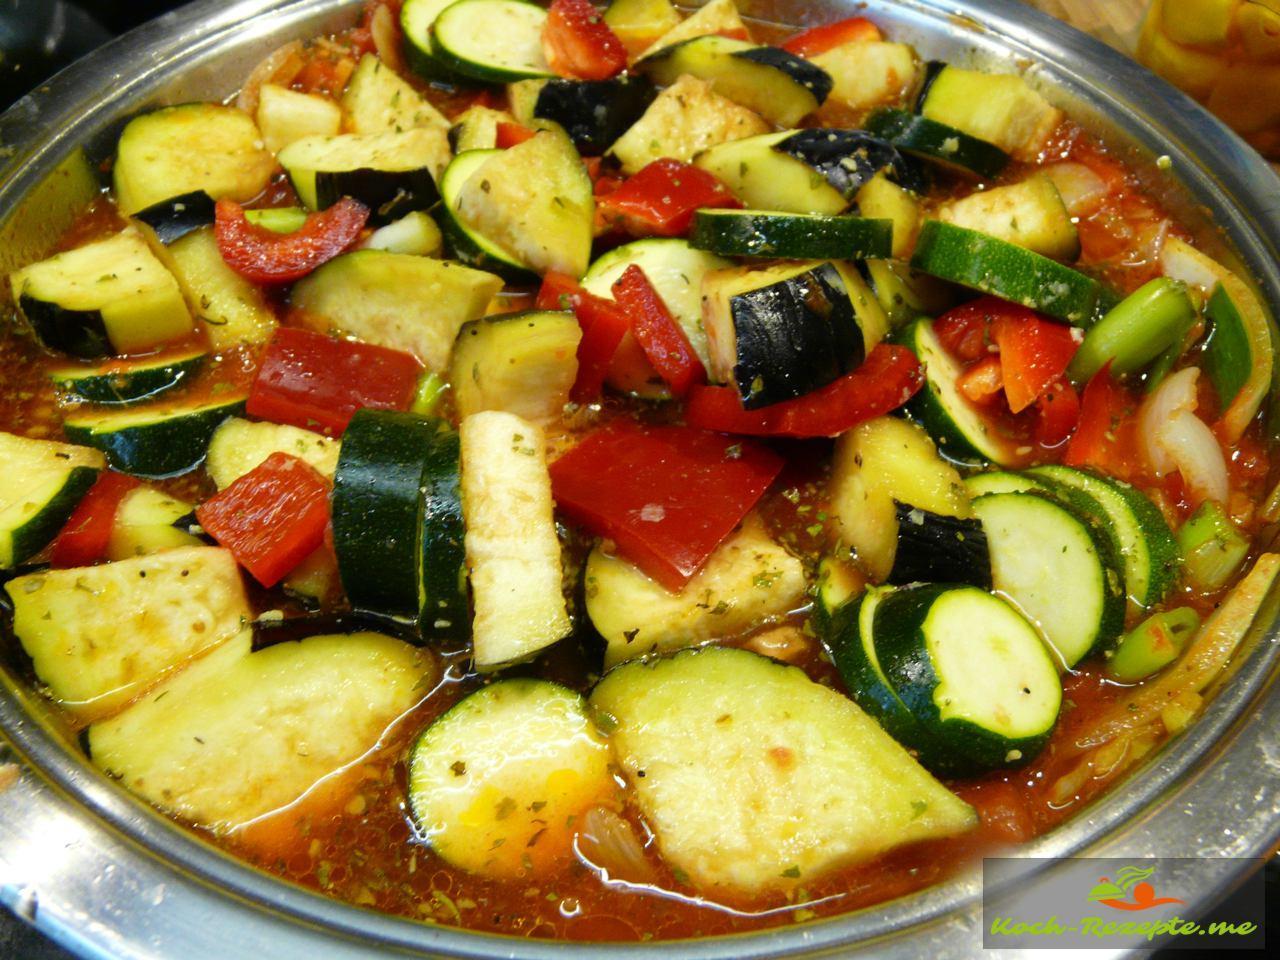 Gemüse noch 40 Minuten köcheln lassen